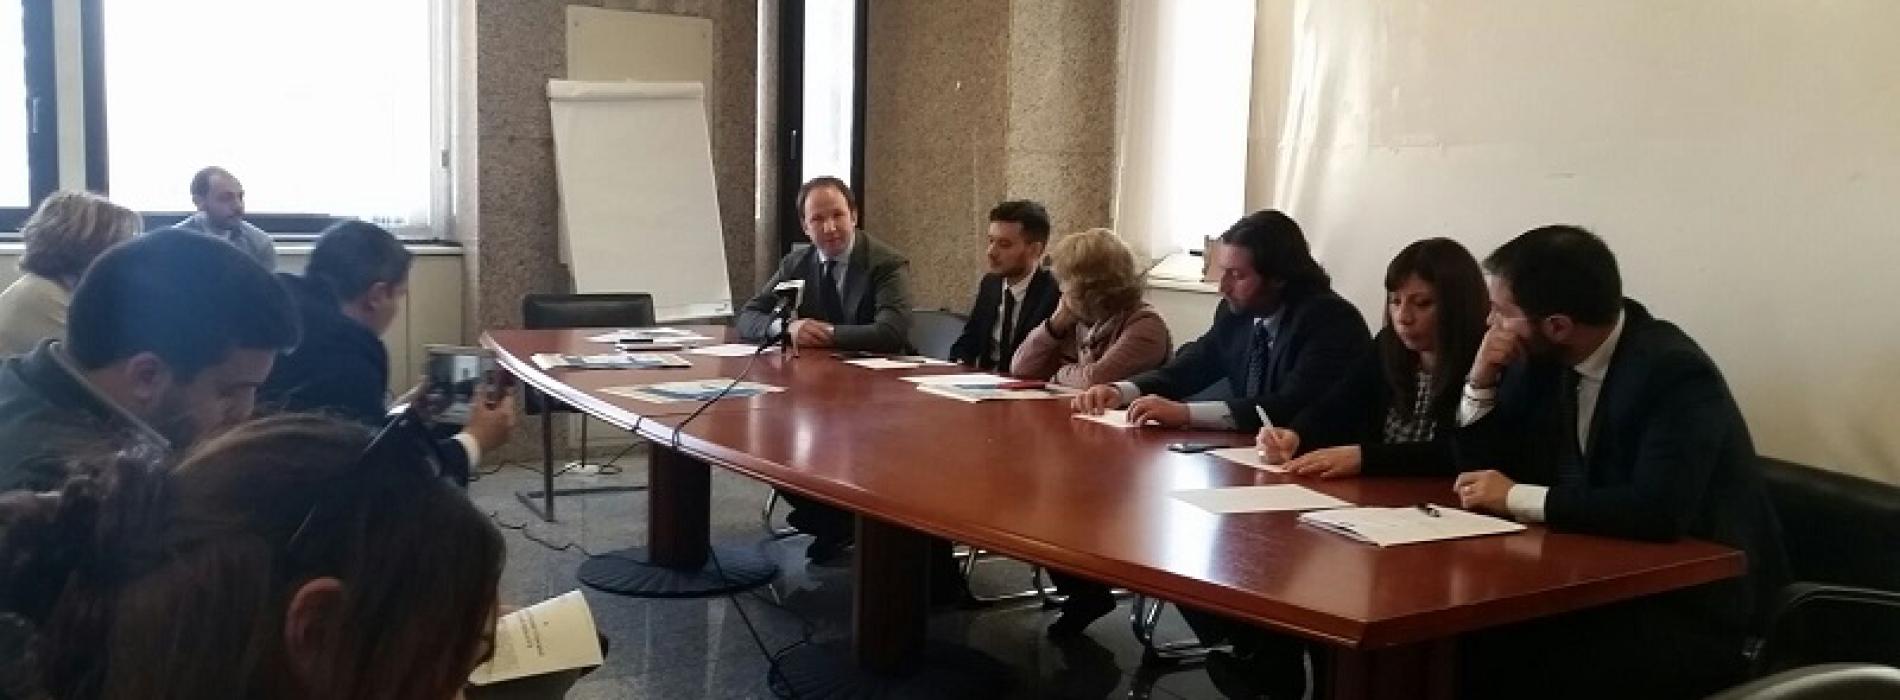 Diritti umani. Zinzi: Inaccettabile la situazione di carenza idrica al carcere di Santa Maria Capua Vetere